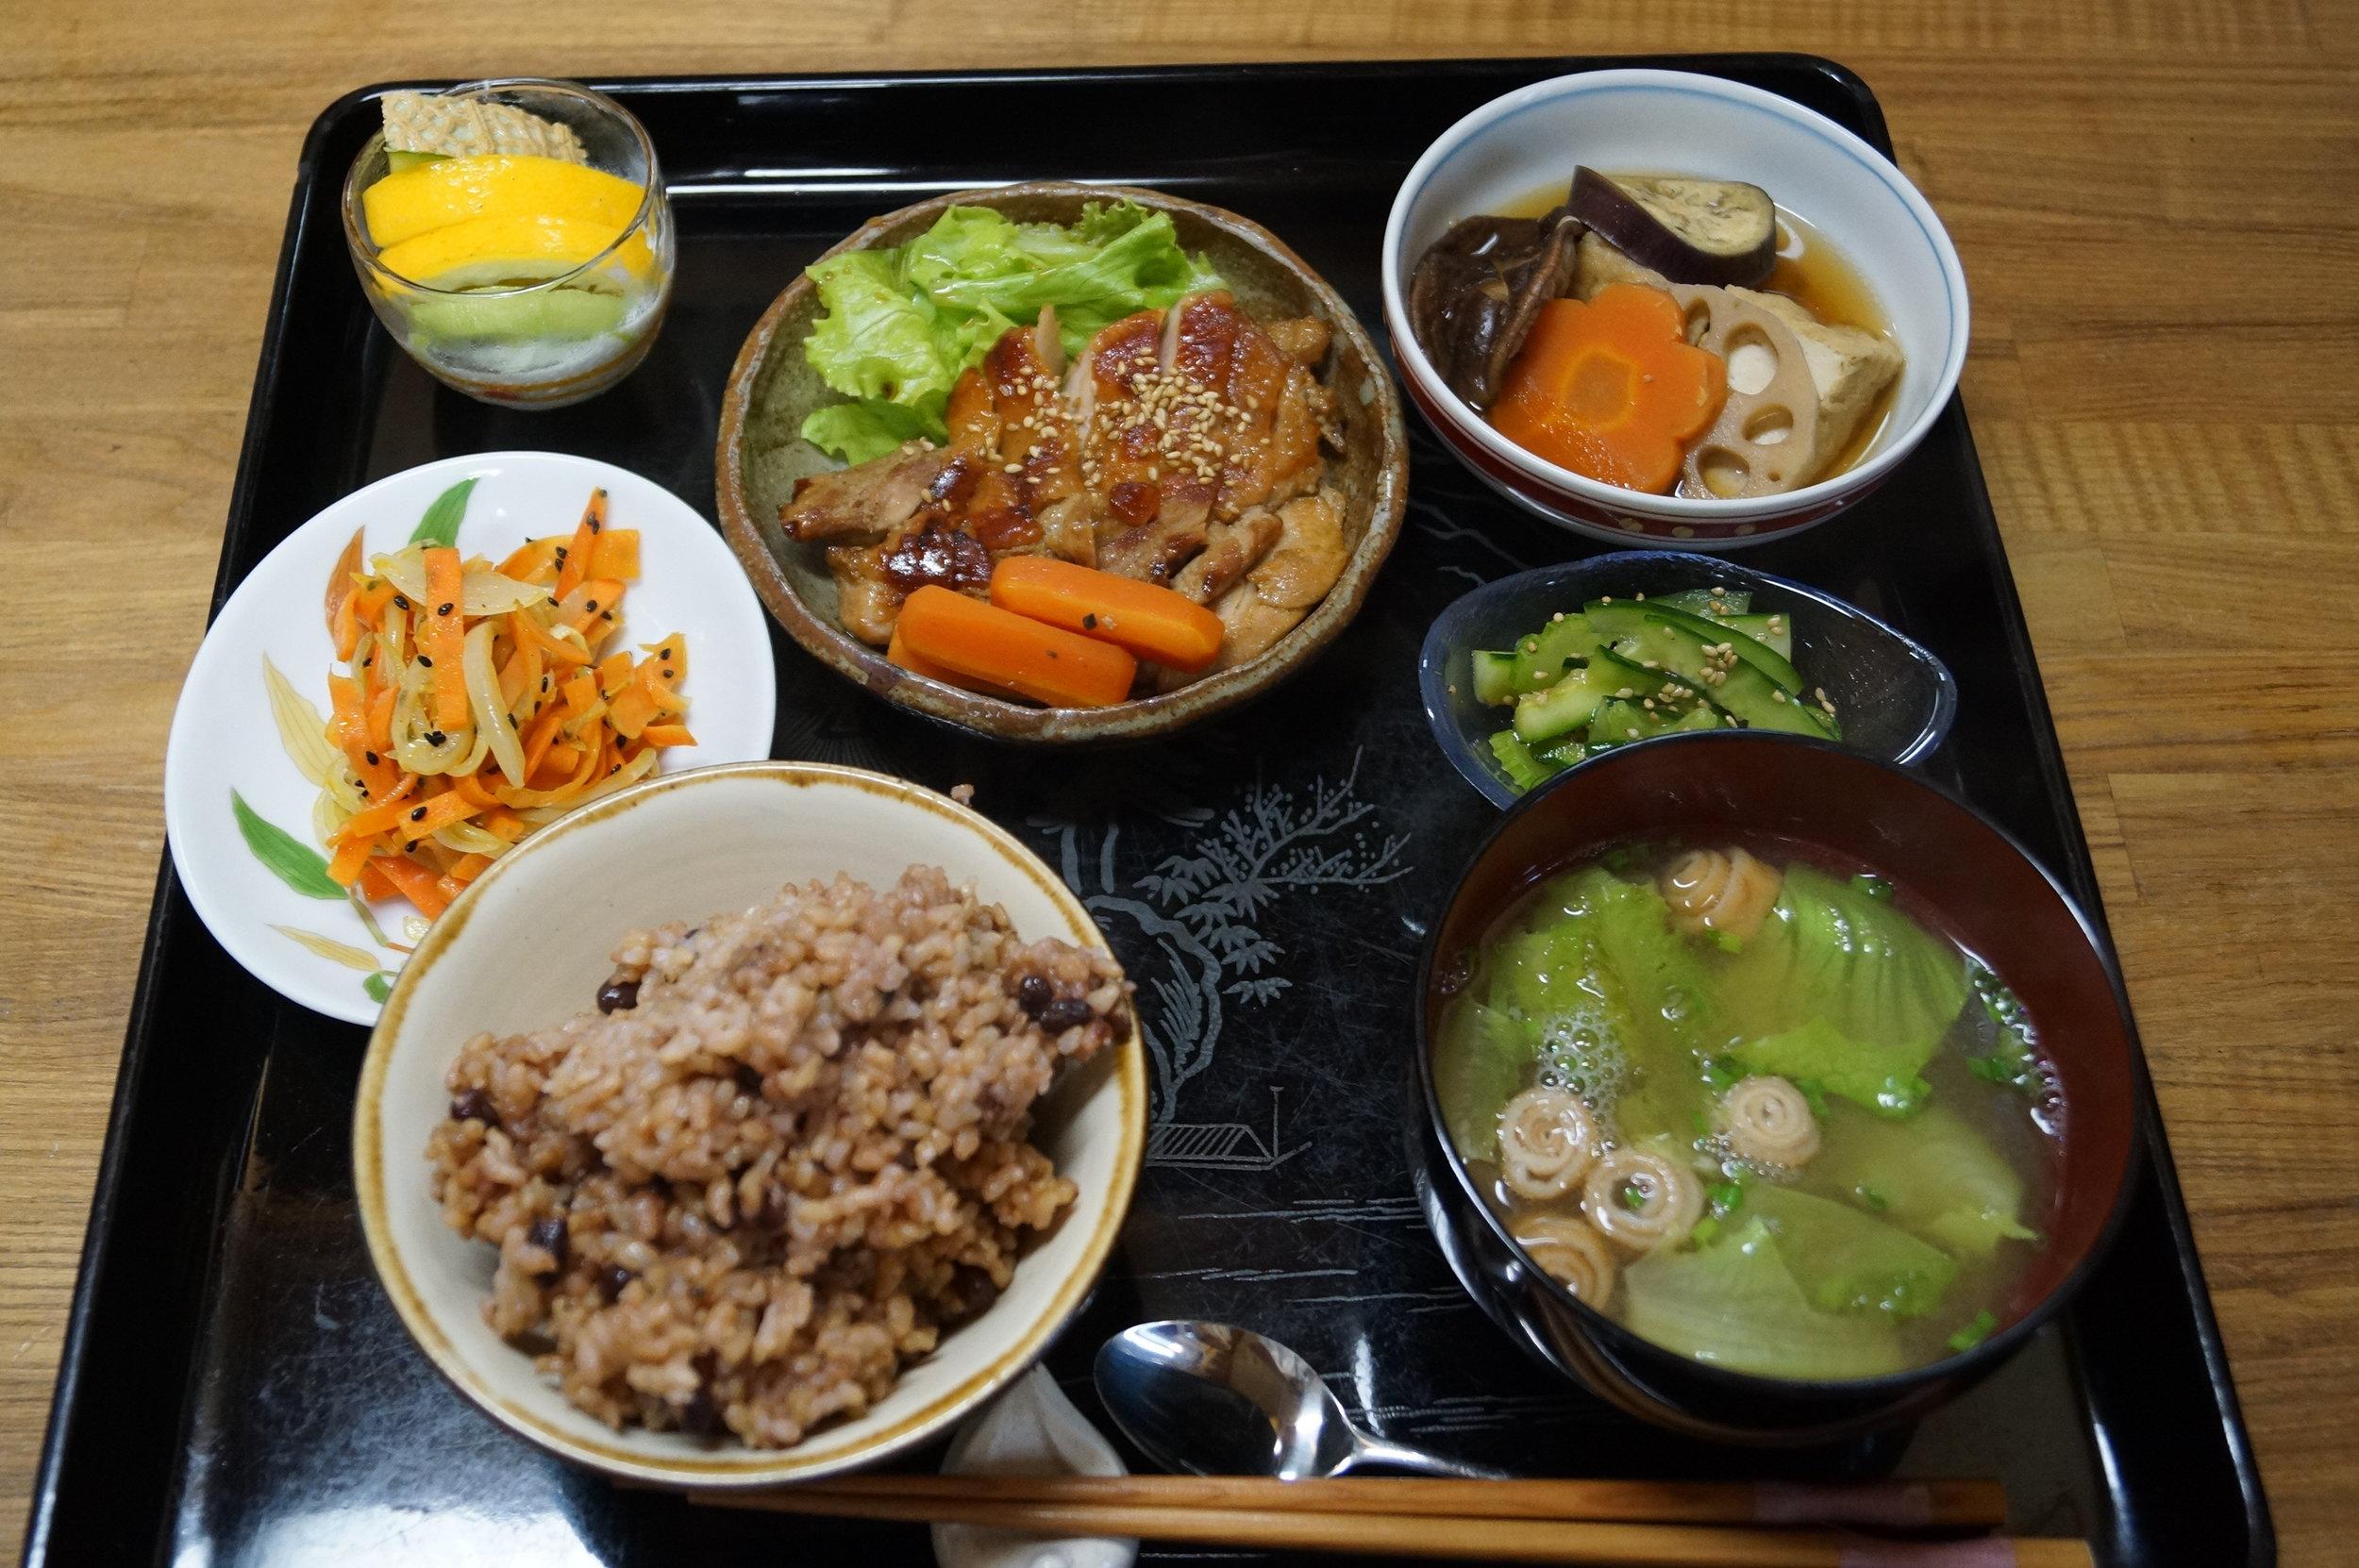 A seasonal, traditional Okinawan meal served. Photo credit: Yui Clinic